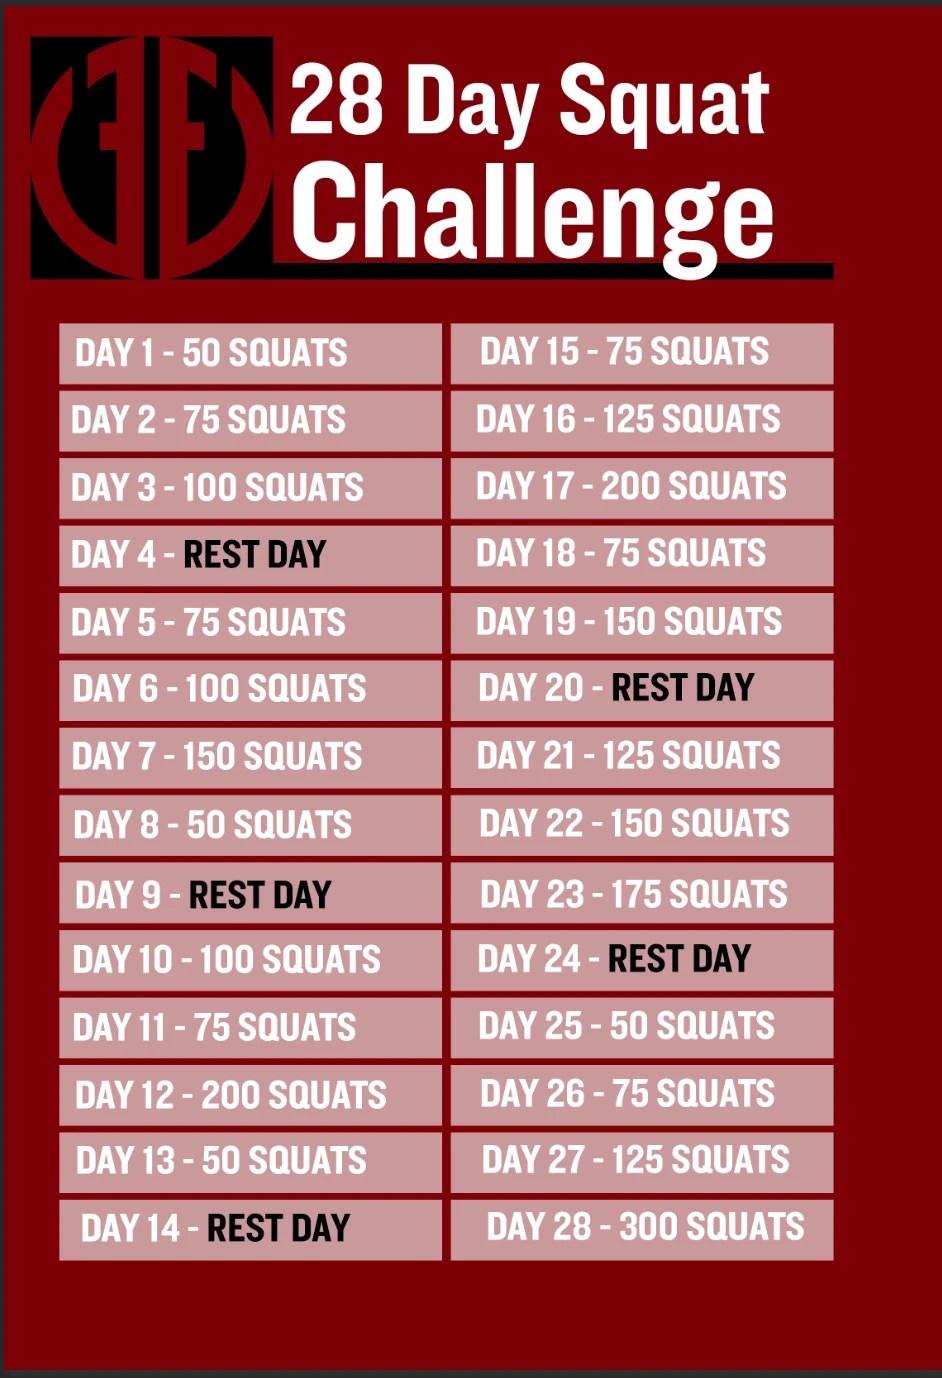 February 28 Day Squat Challenge